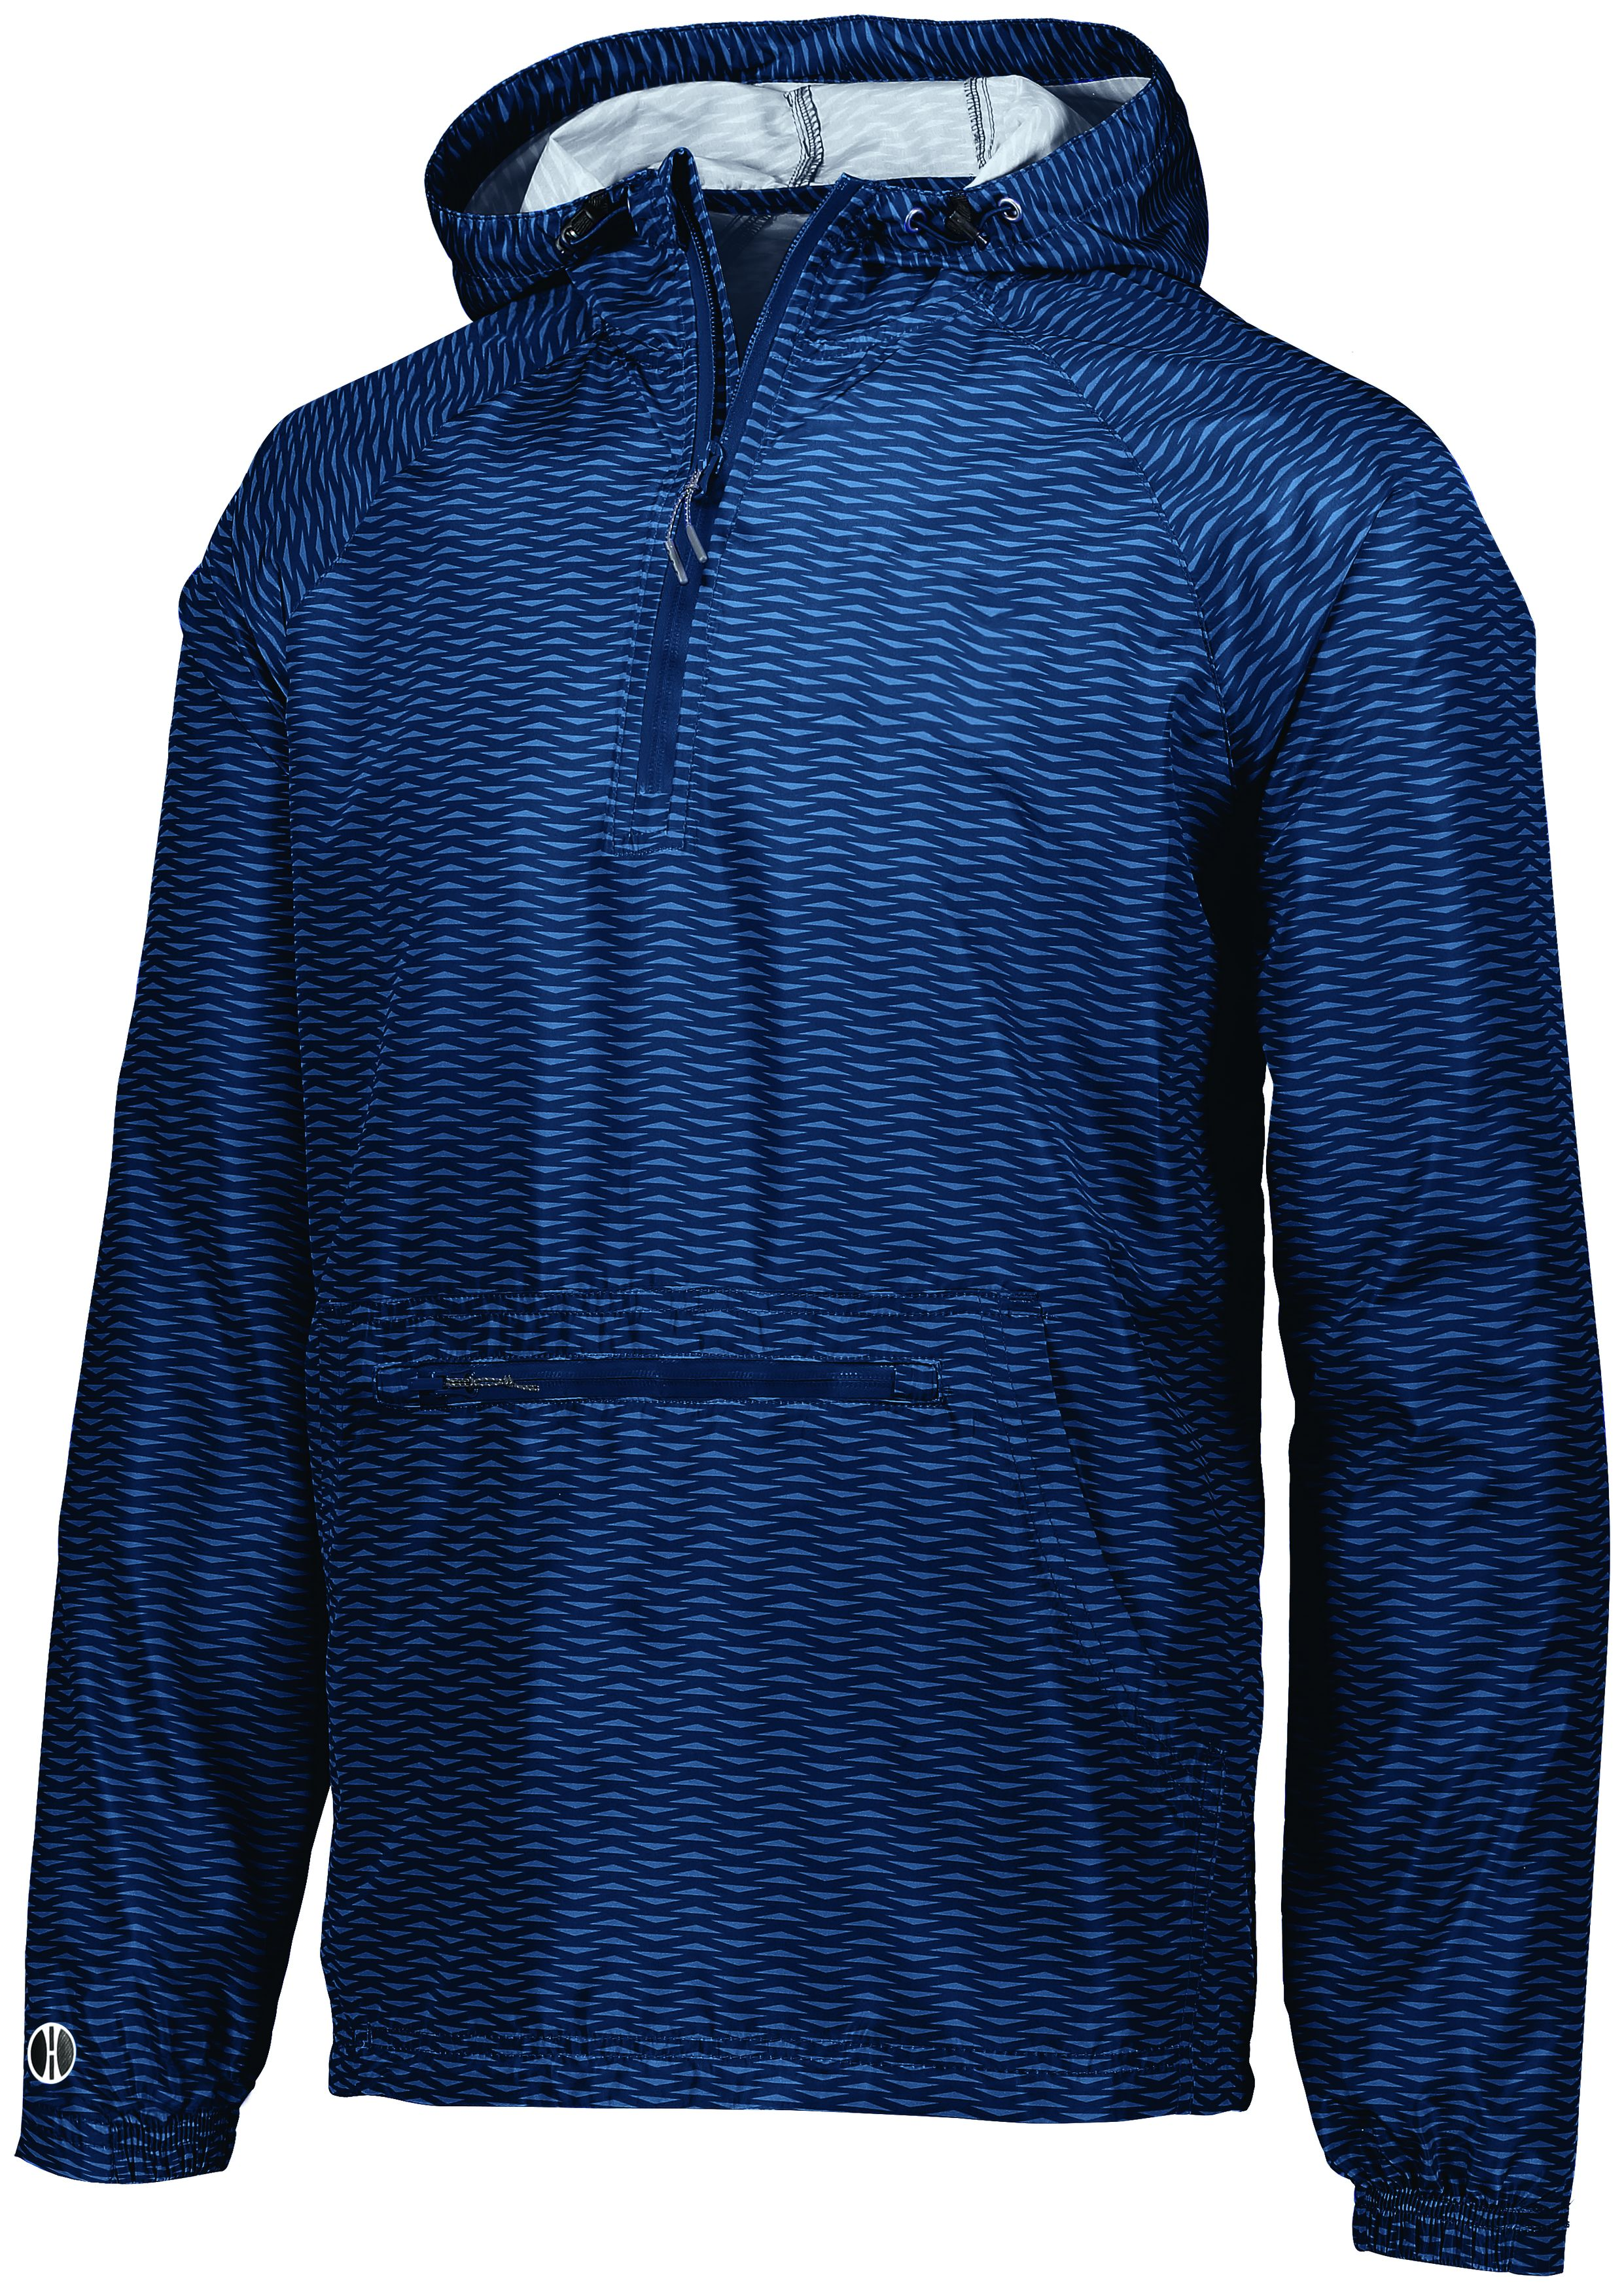 Range Packable Pullover - NAVY